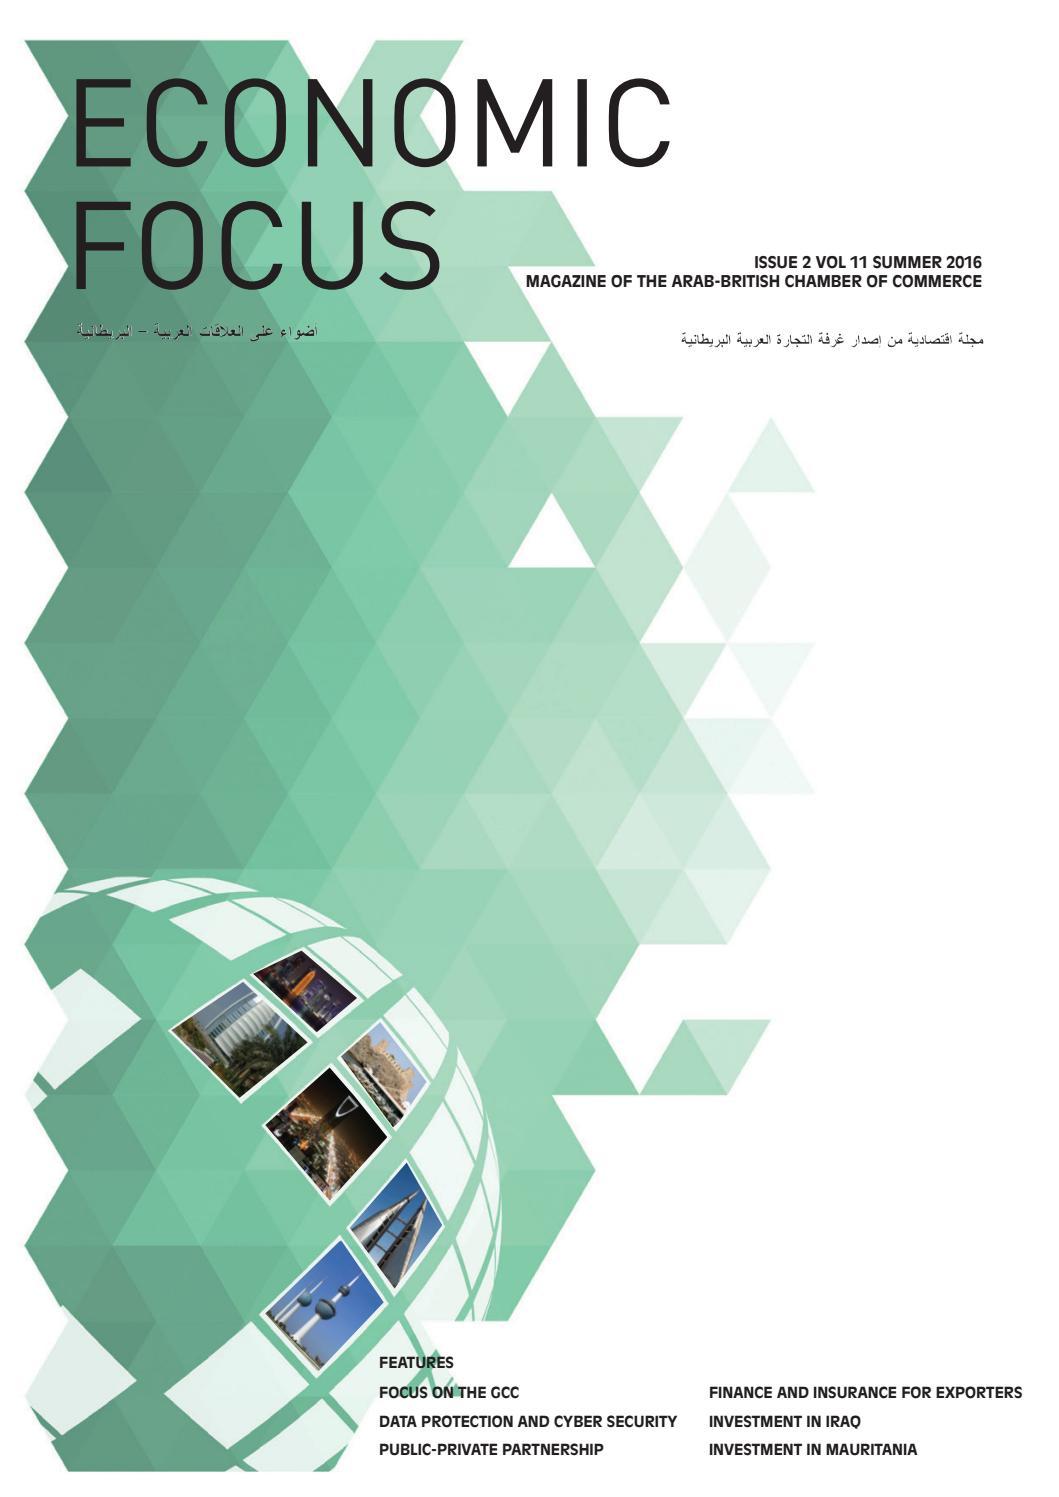 9895bb6188cea Economic Focus 12 by Distinctive Publishing - issuu